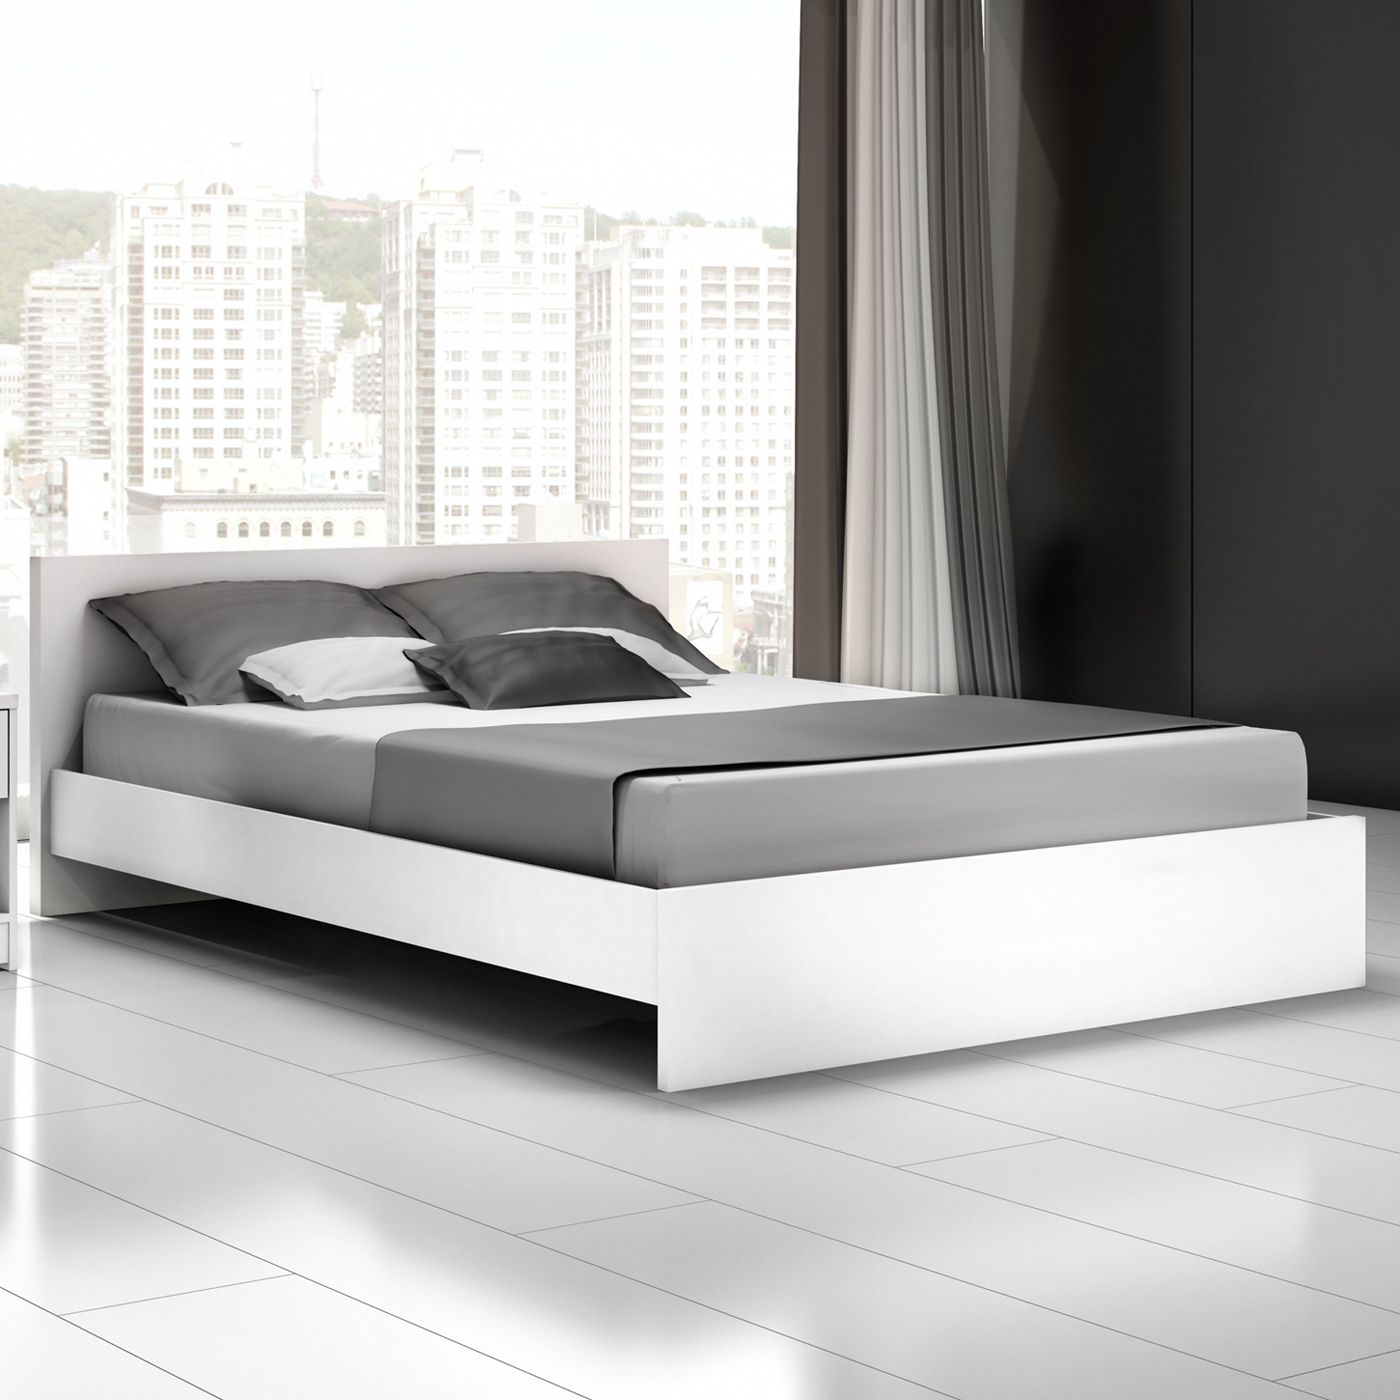 Shop Stellar Home Furniture S20 Euro Platform Bed & Headboard at